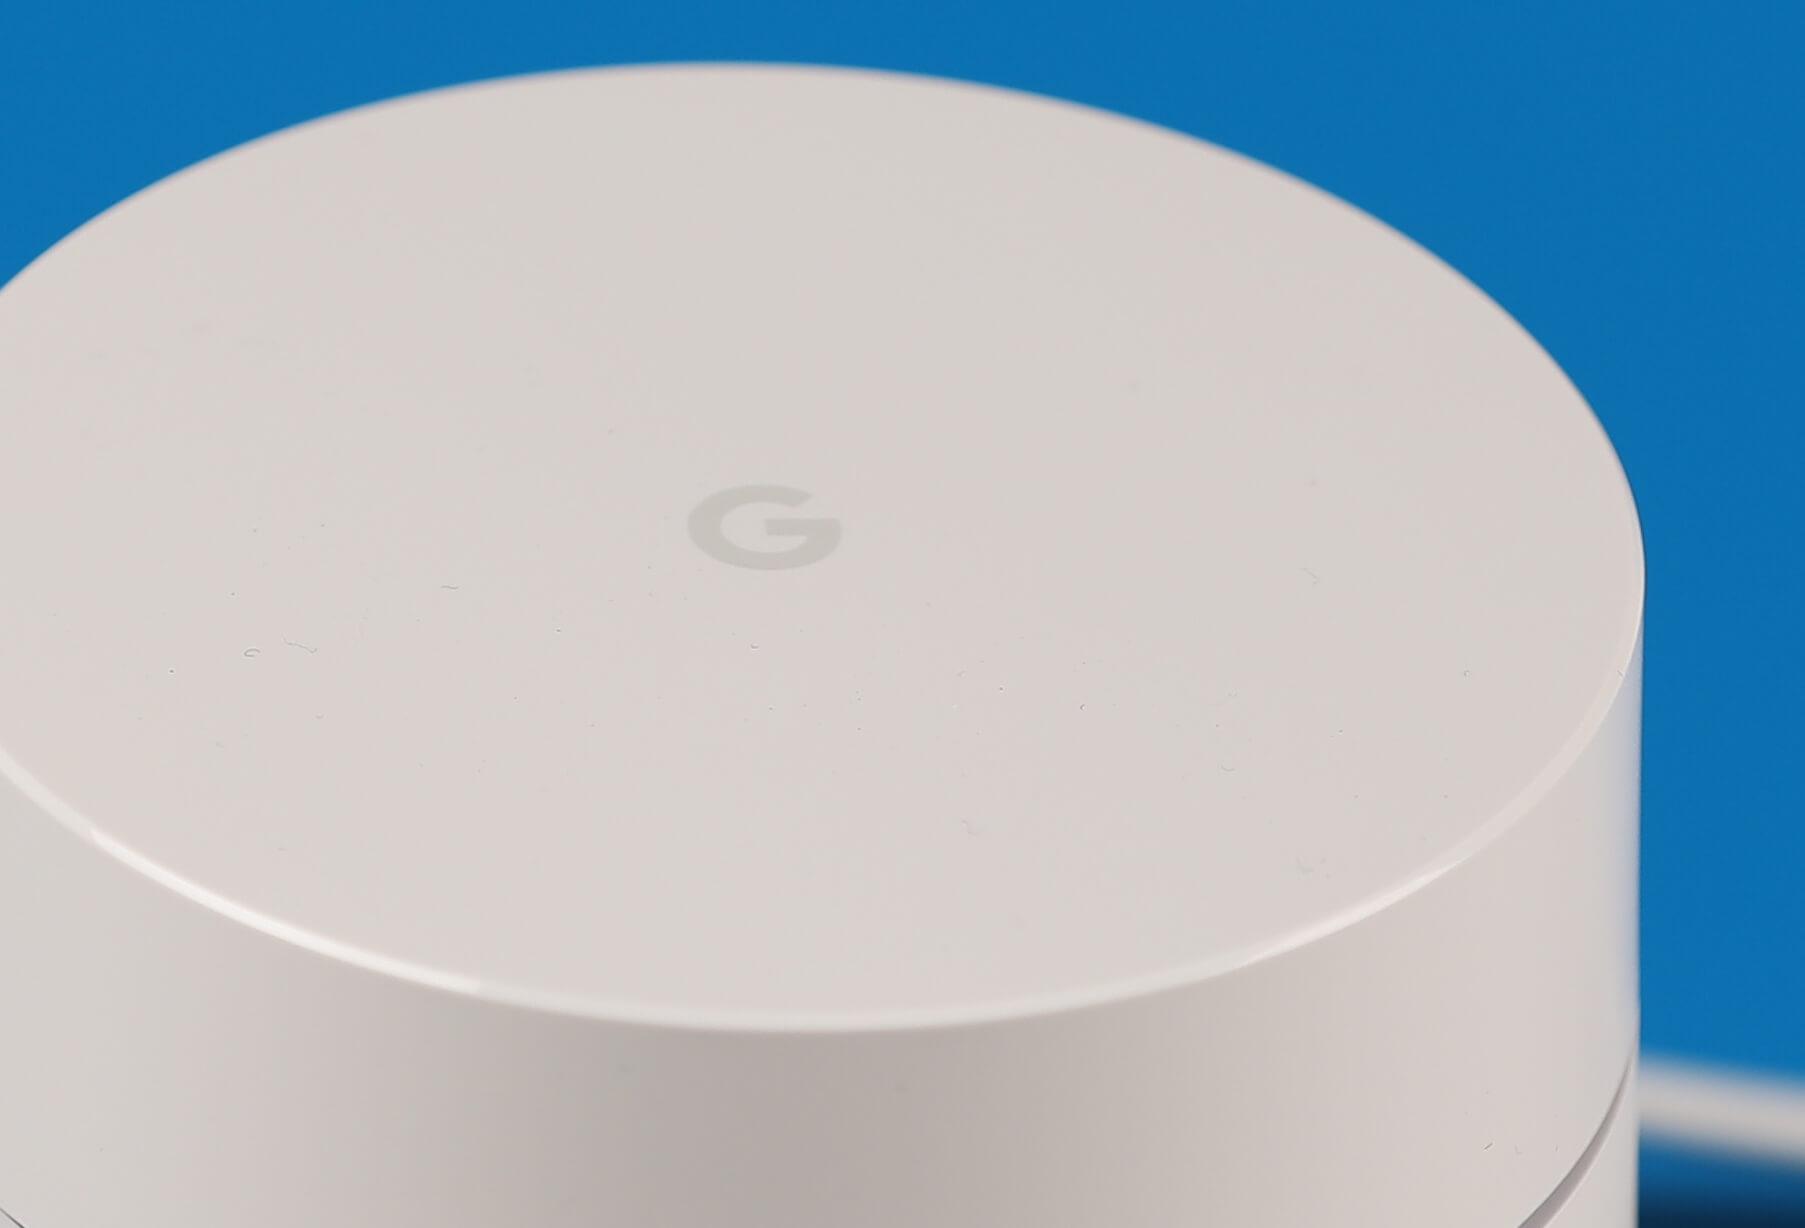 Google Wifi.